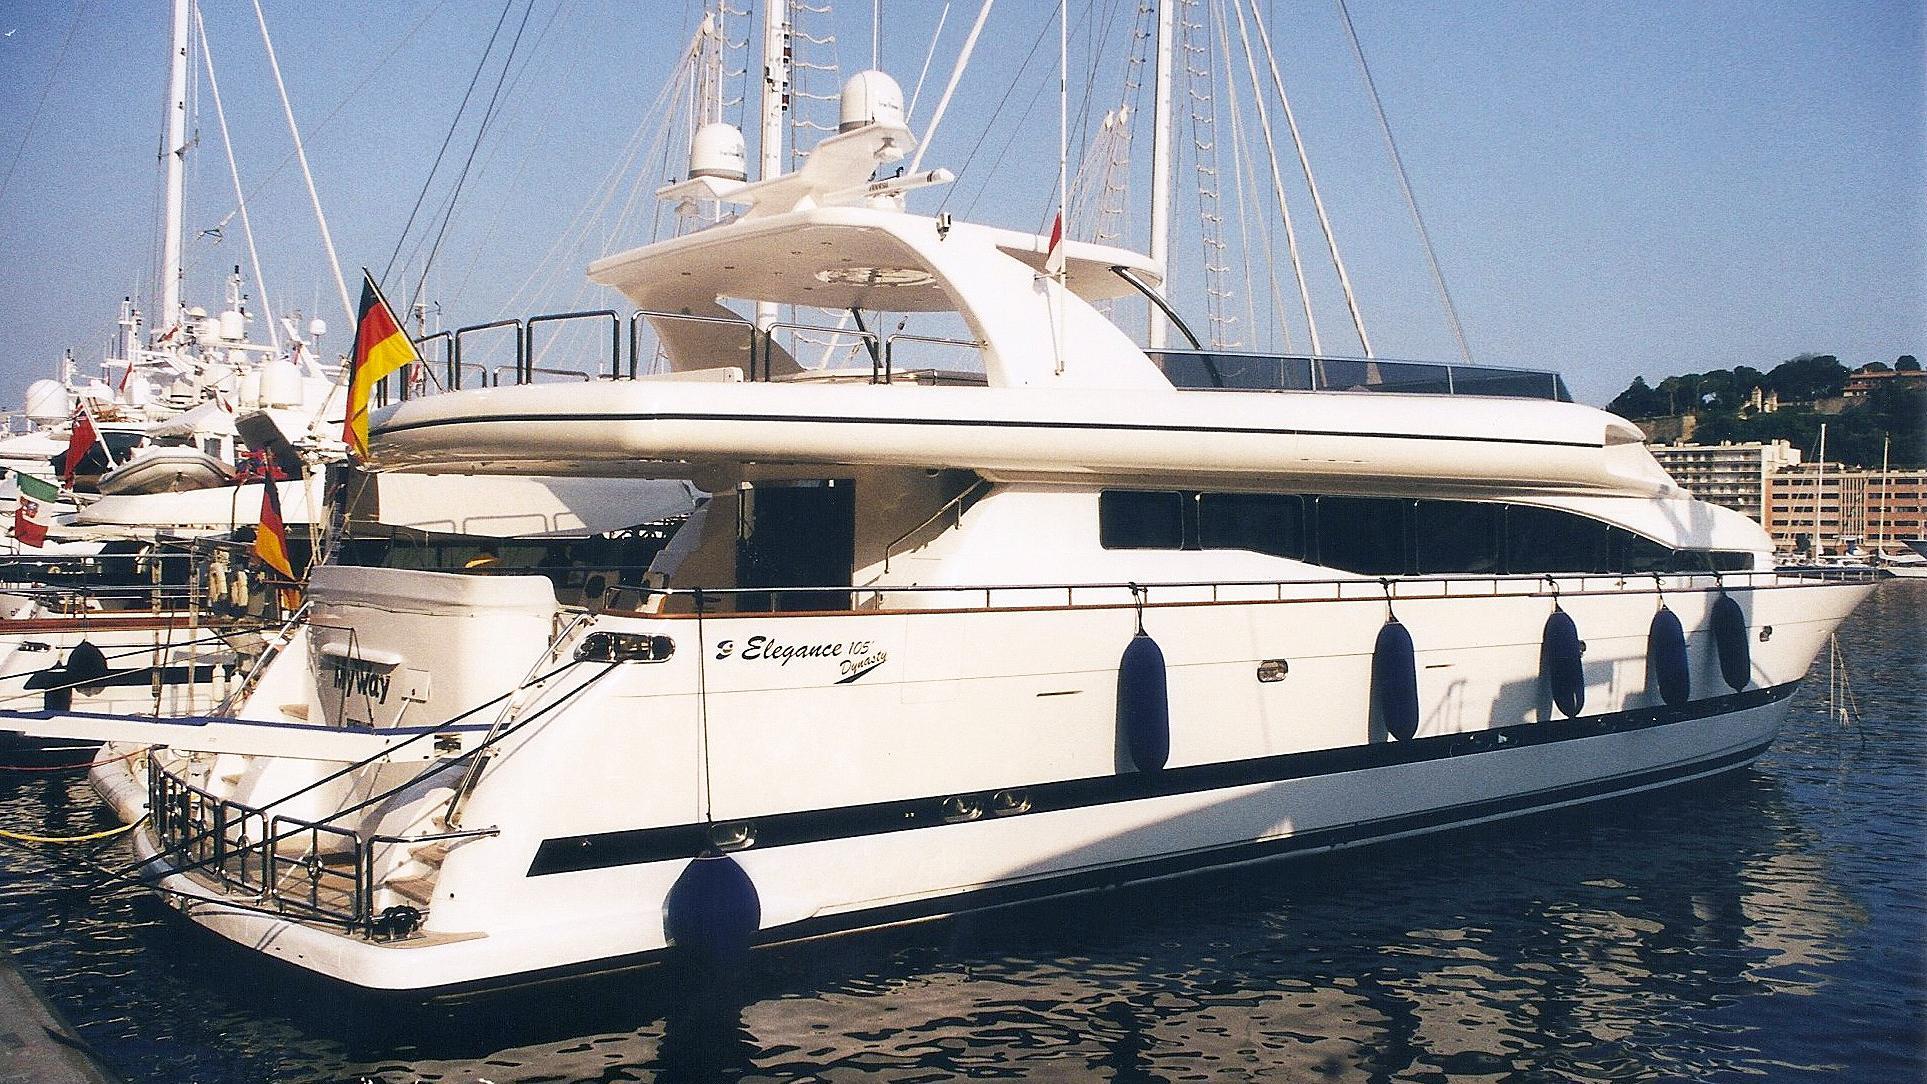 my-way-motor-yacht-horizon-drettmann-elegance-105-2002-32m-stern